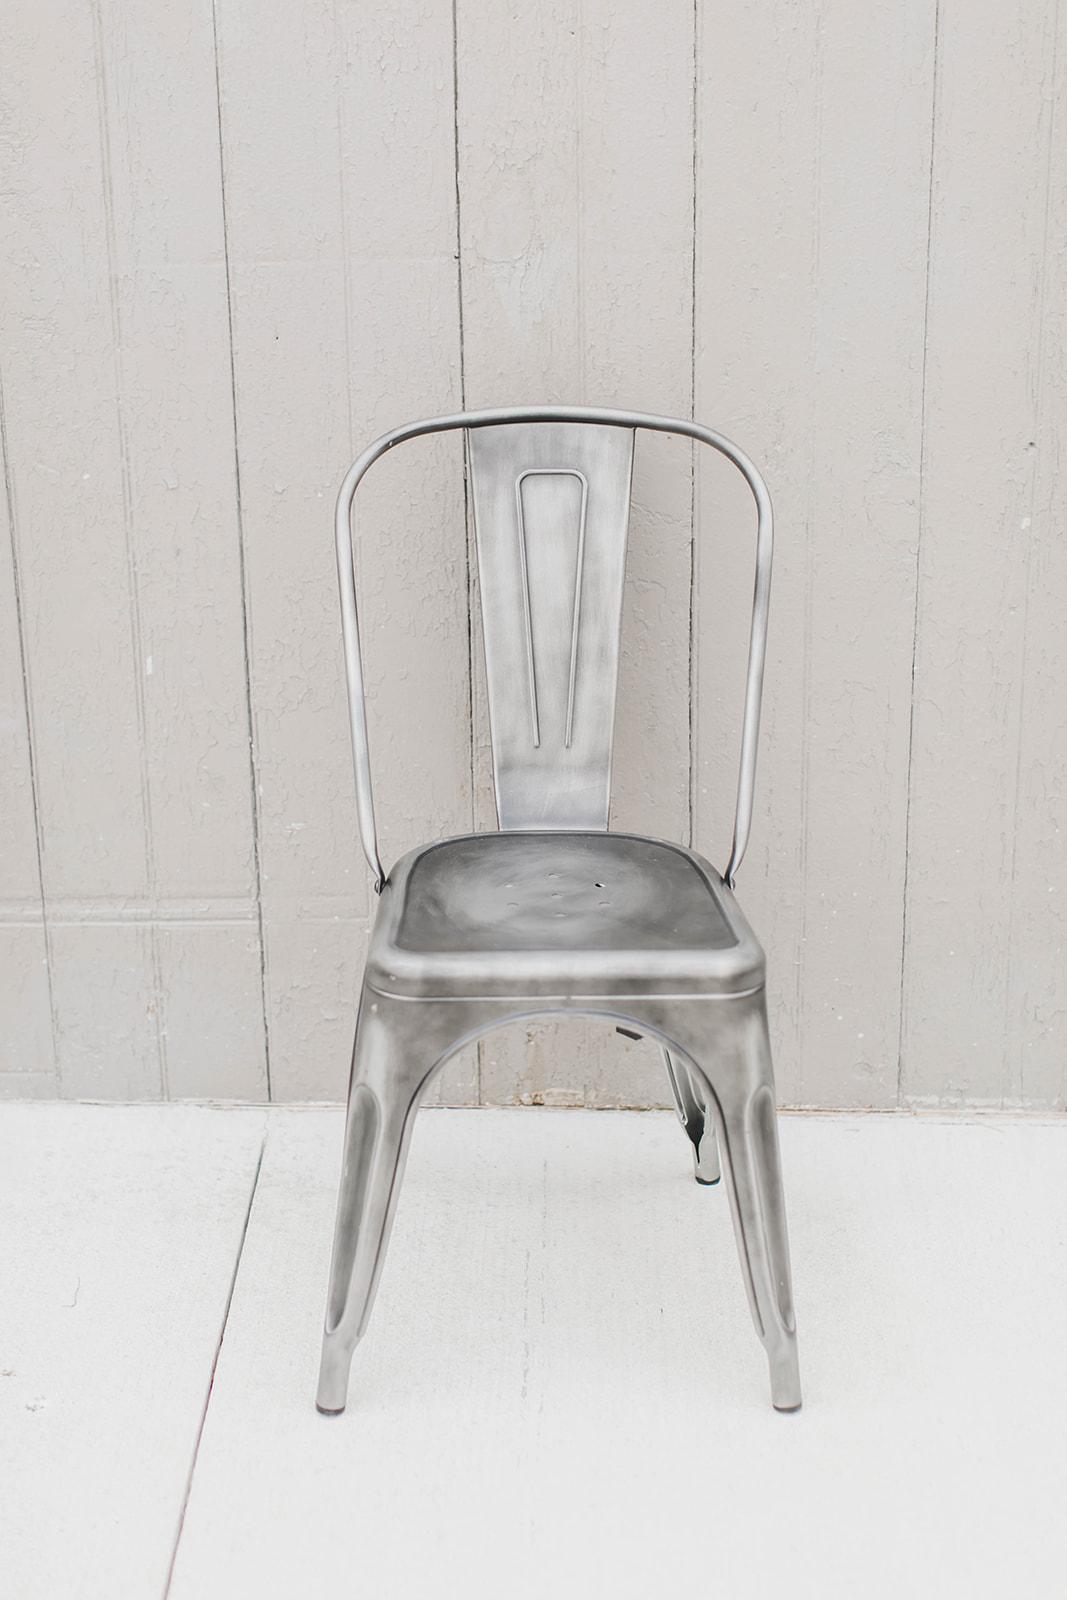 Image of Industrial Chair Rental